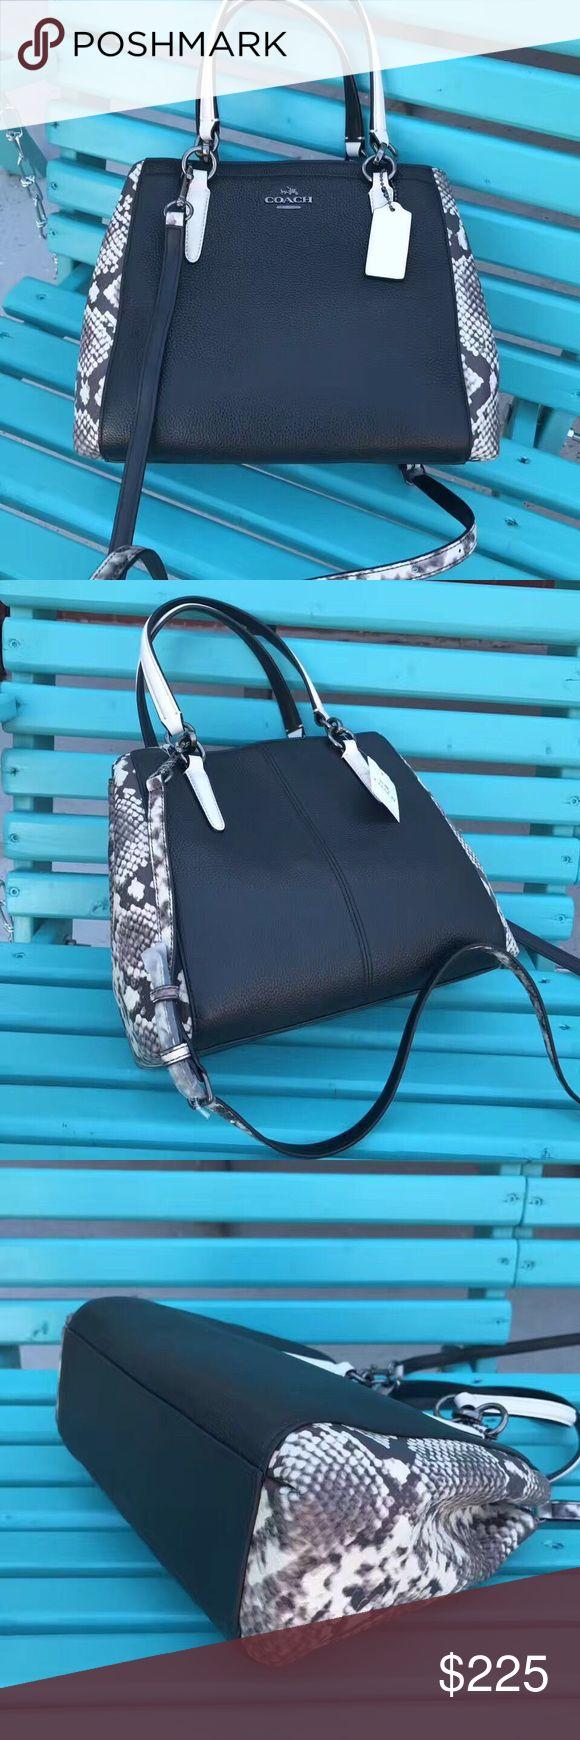 New Coach Handbag New Coach Handbag Coach Bags Shoulder Bags